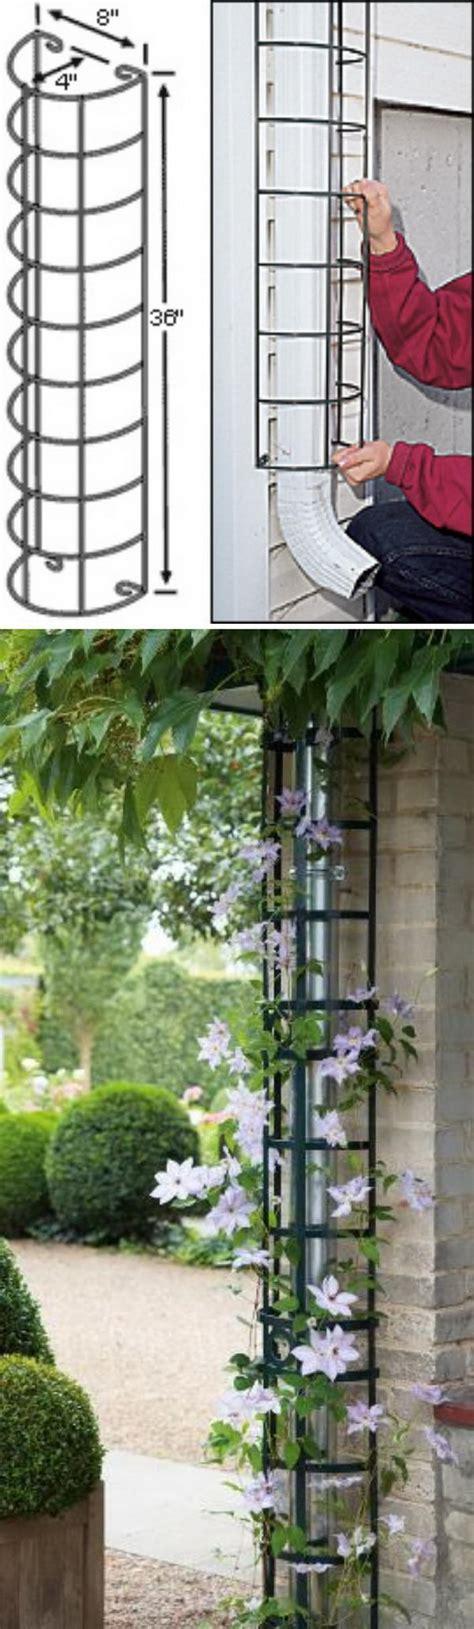 Diy Garden Trellis Ideas 20 Awesome Diy Garden Trellis Projects Hative